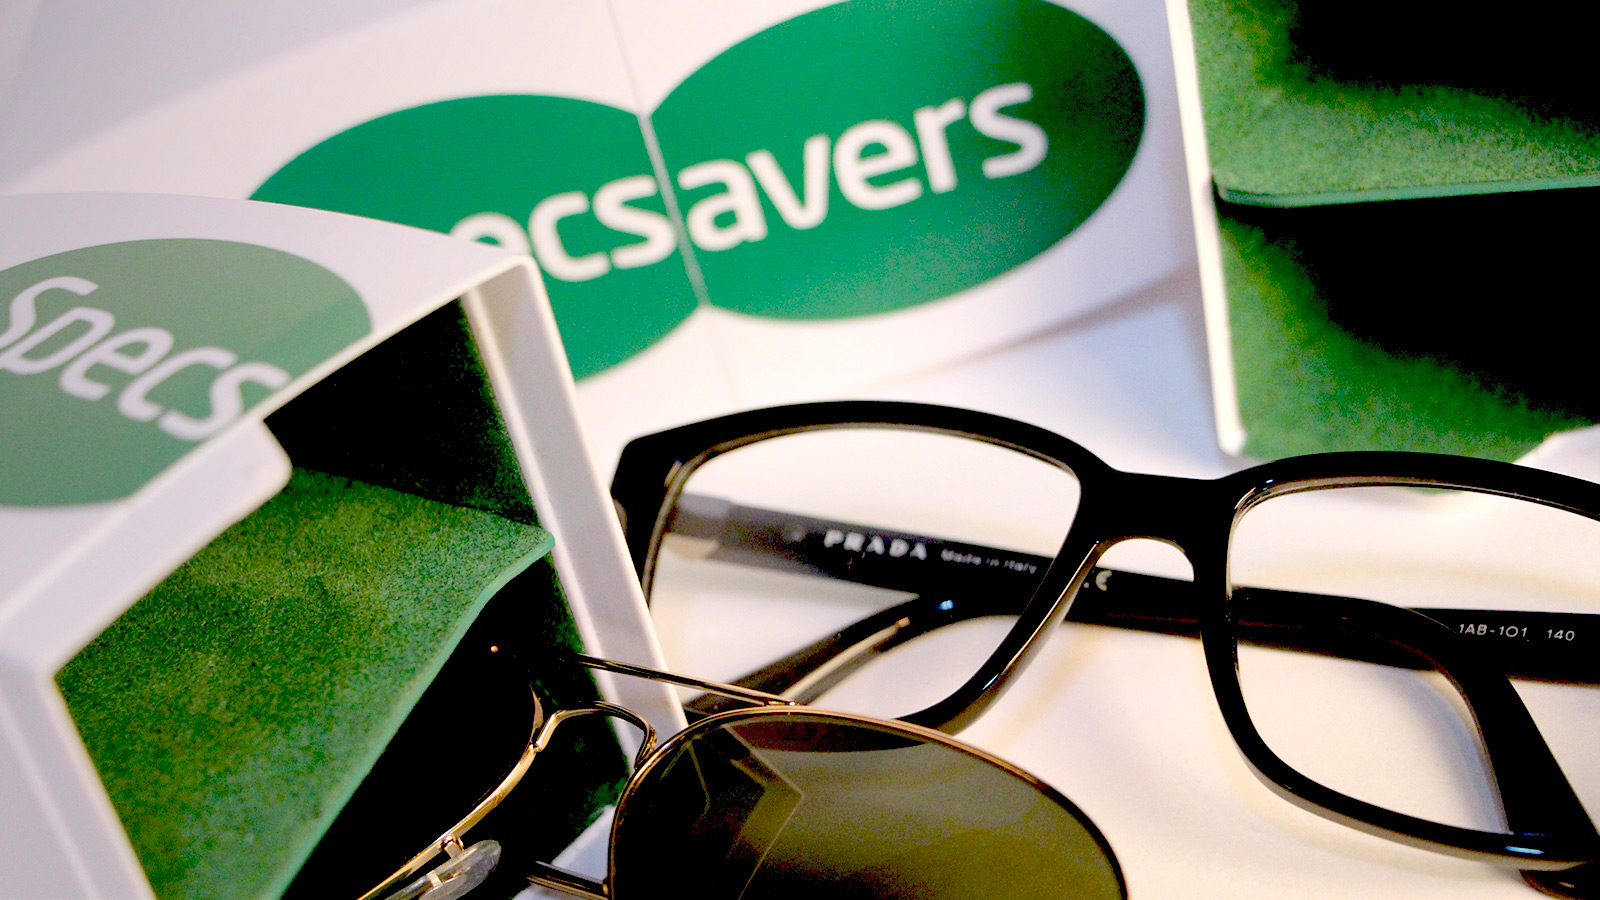 Brillenhulp | Specsavers